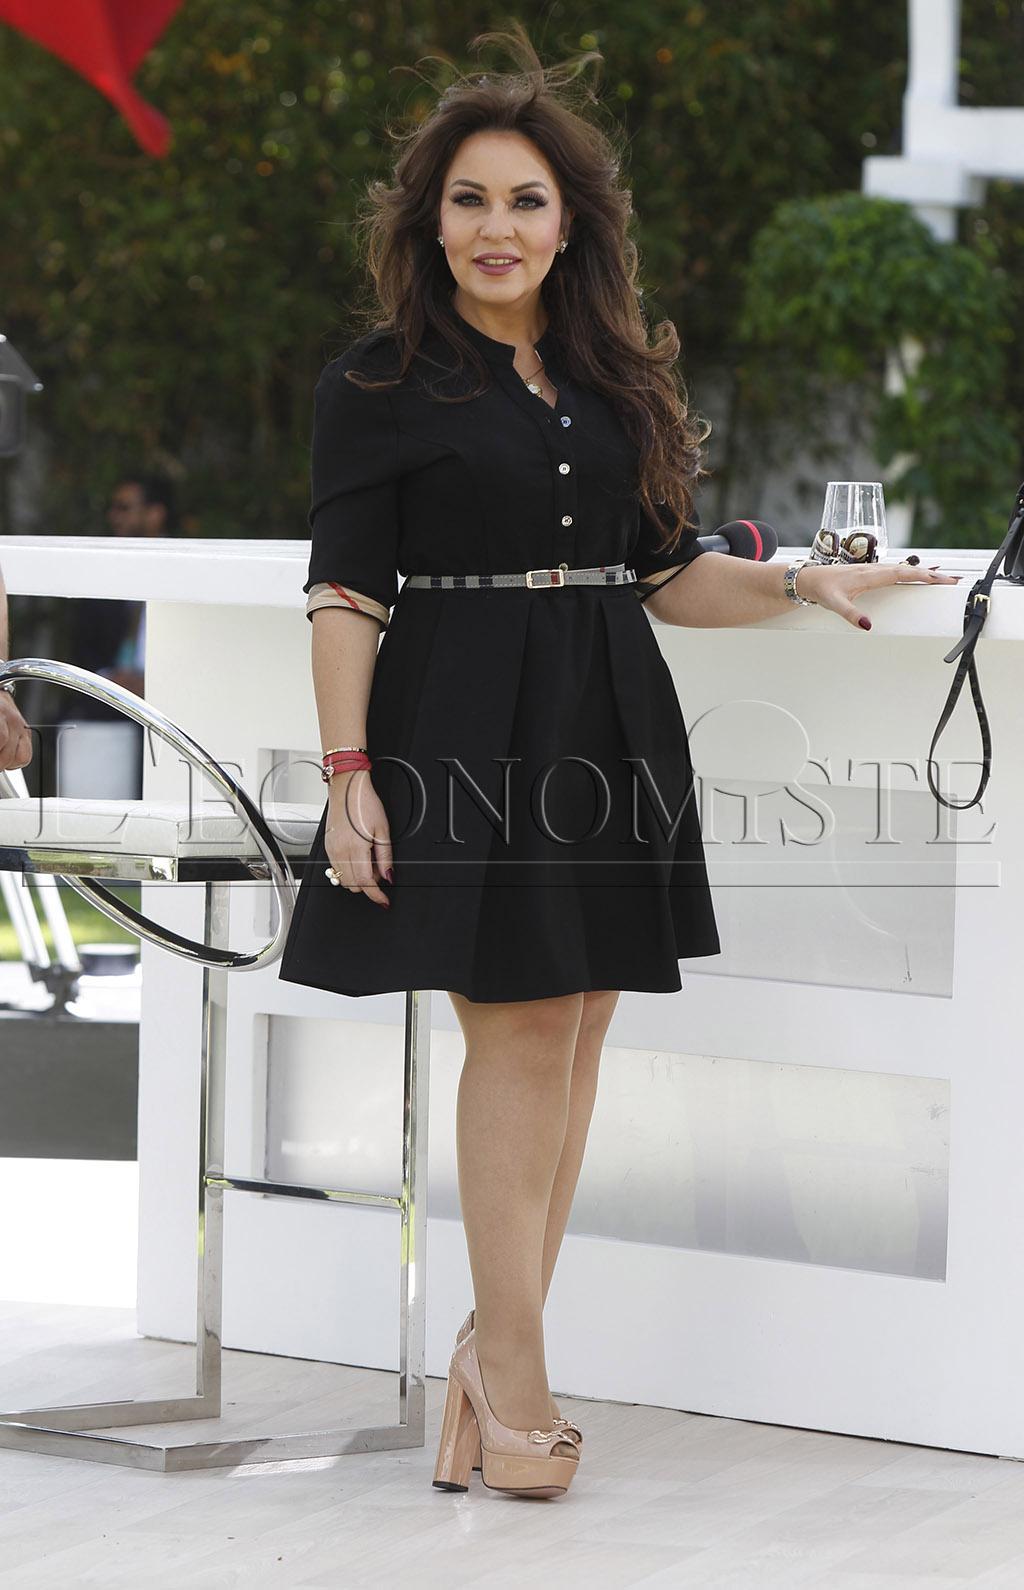 Fatima-Zahra Laaroussi